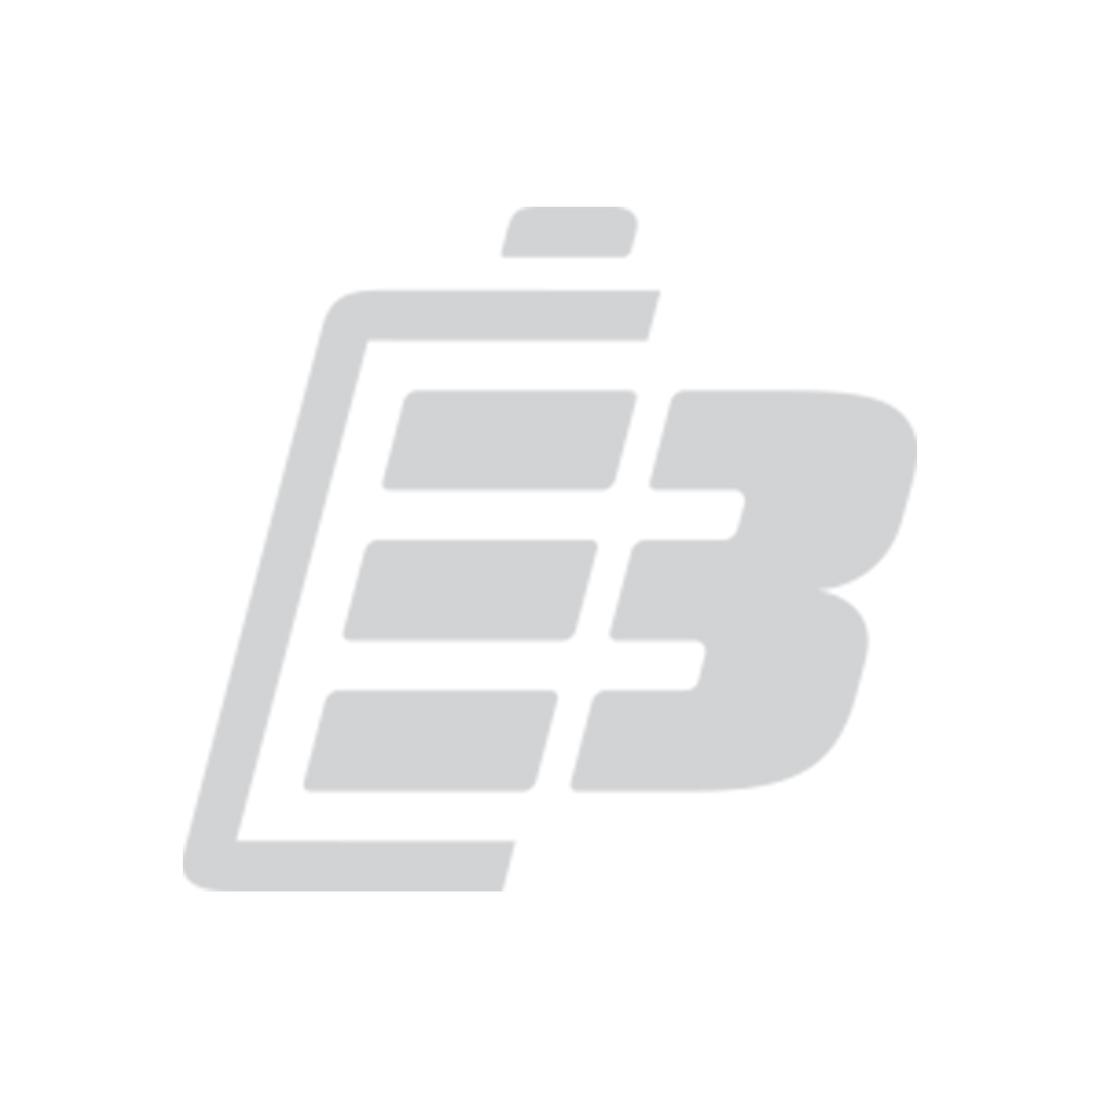 Barcode scanner battery Cipherlab 9300_1